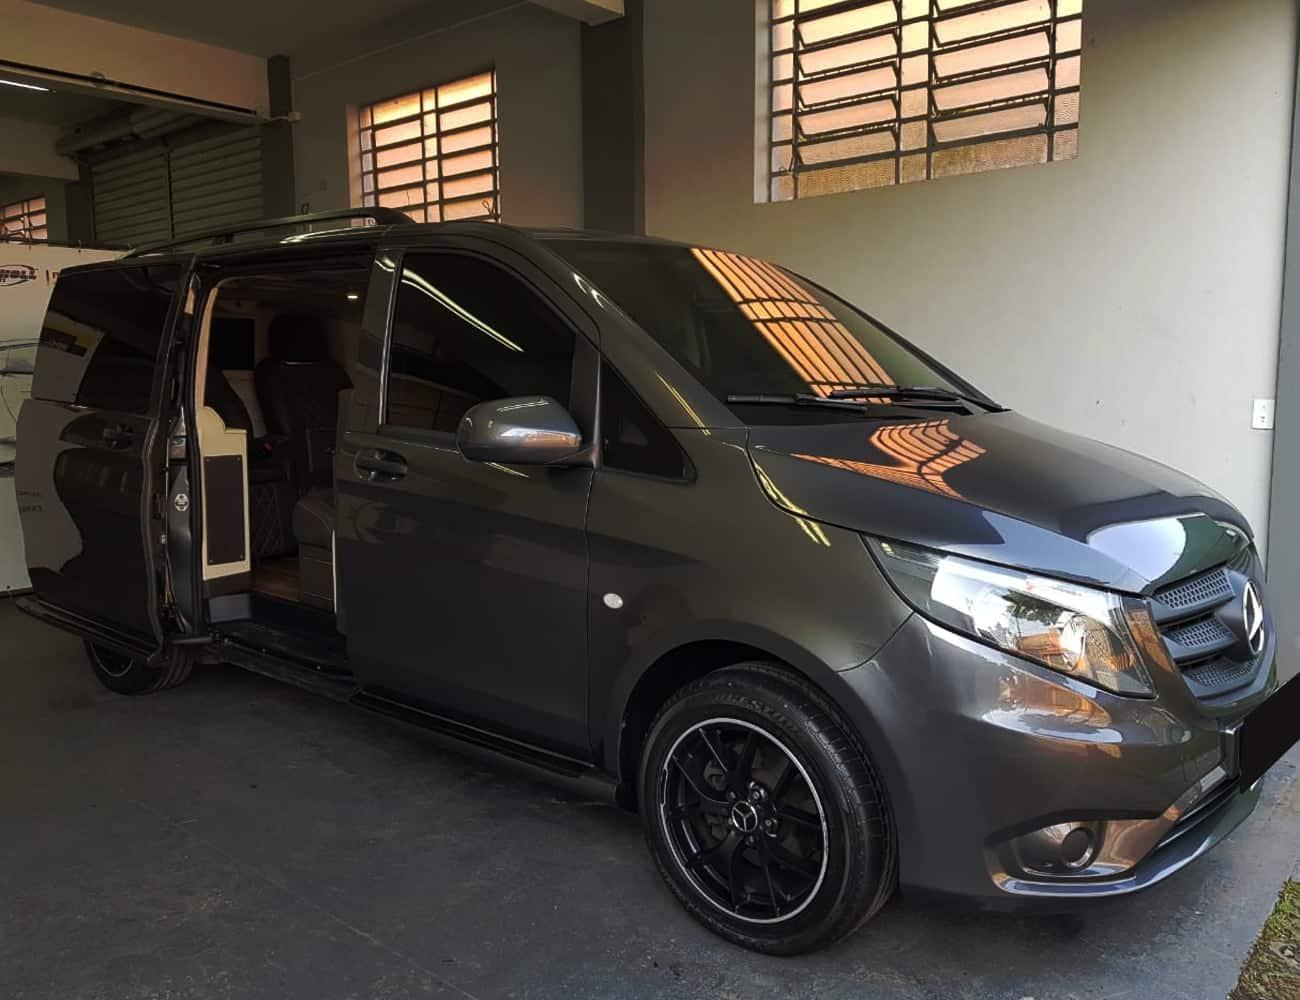 van premium blindada para transporte de empresários e comitivas, escolta armada unity vans